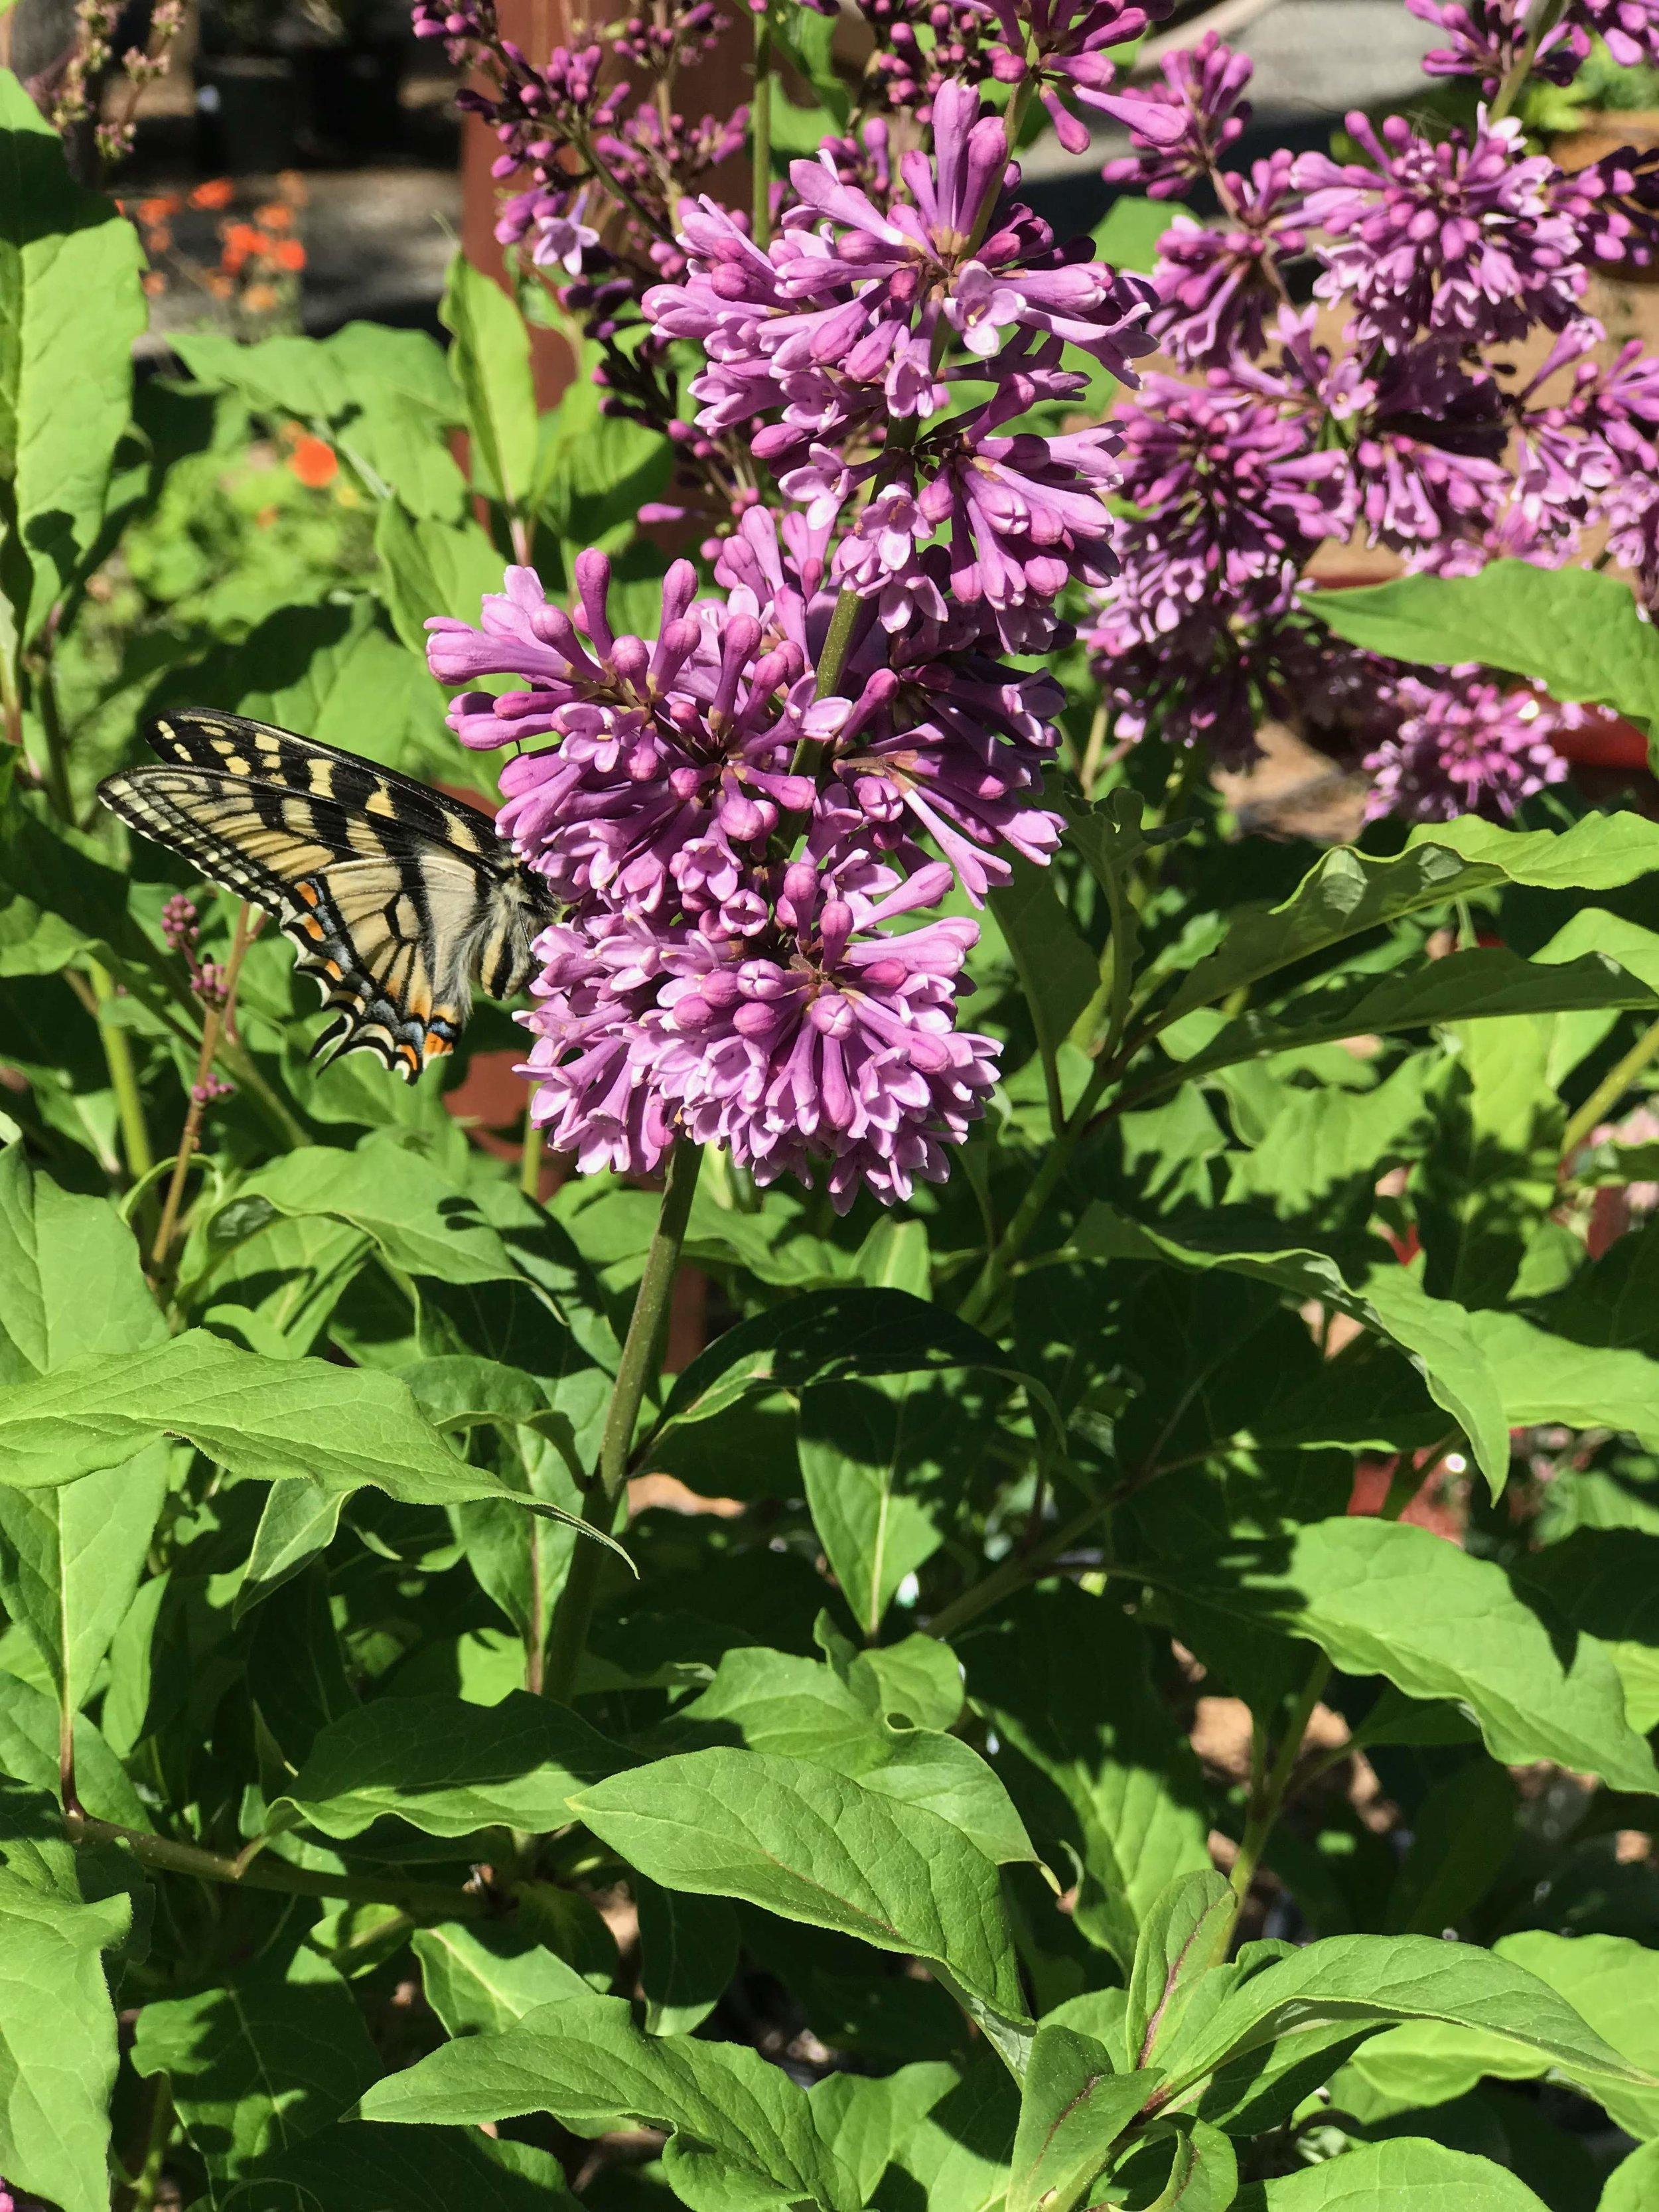 Butterfly enjoying our Lilac bush